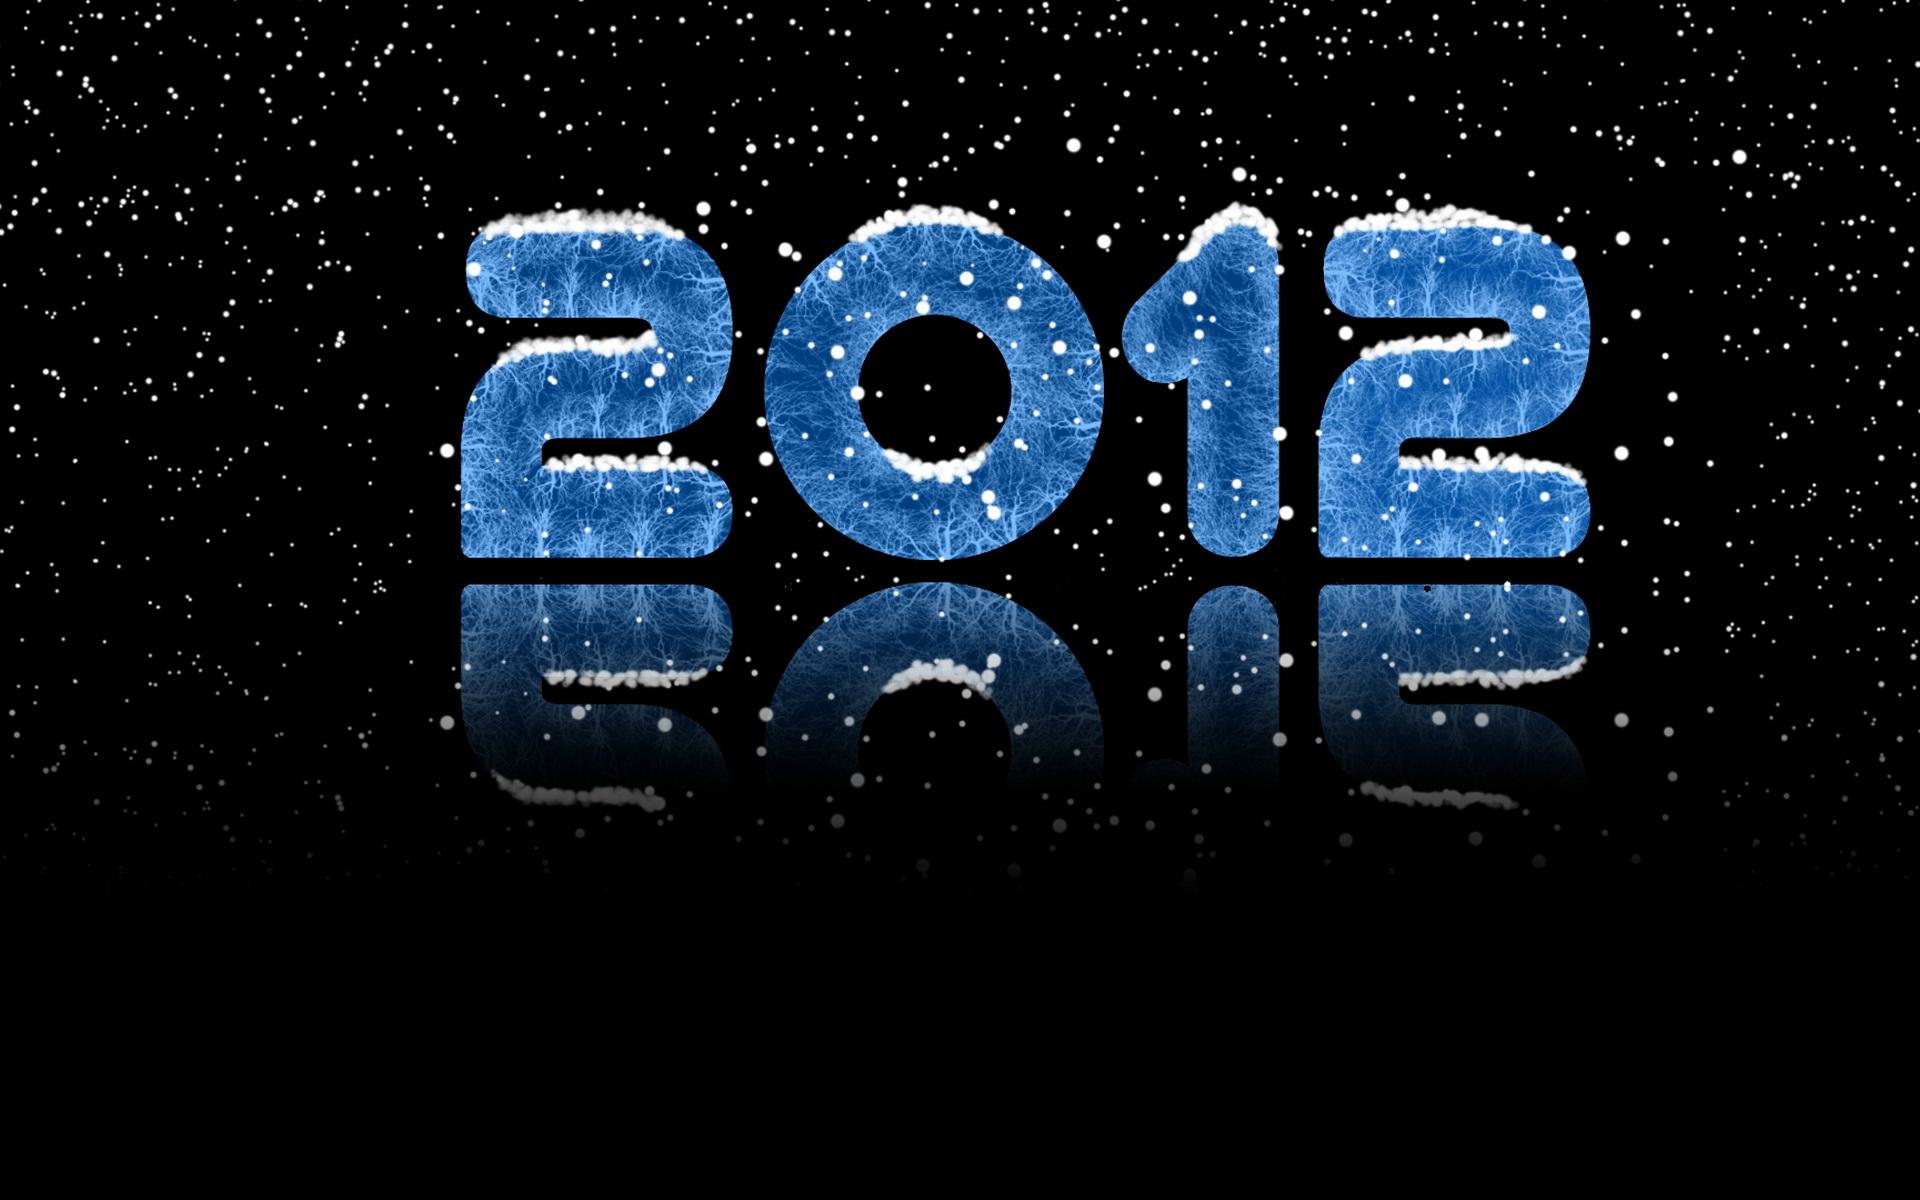 Красивые картинки 2012 год, картинки